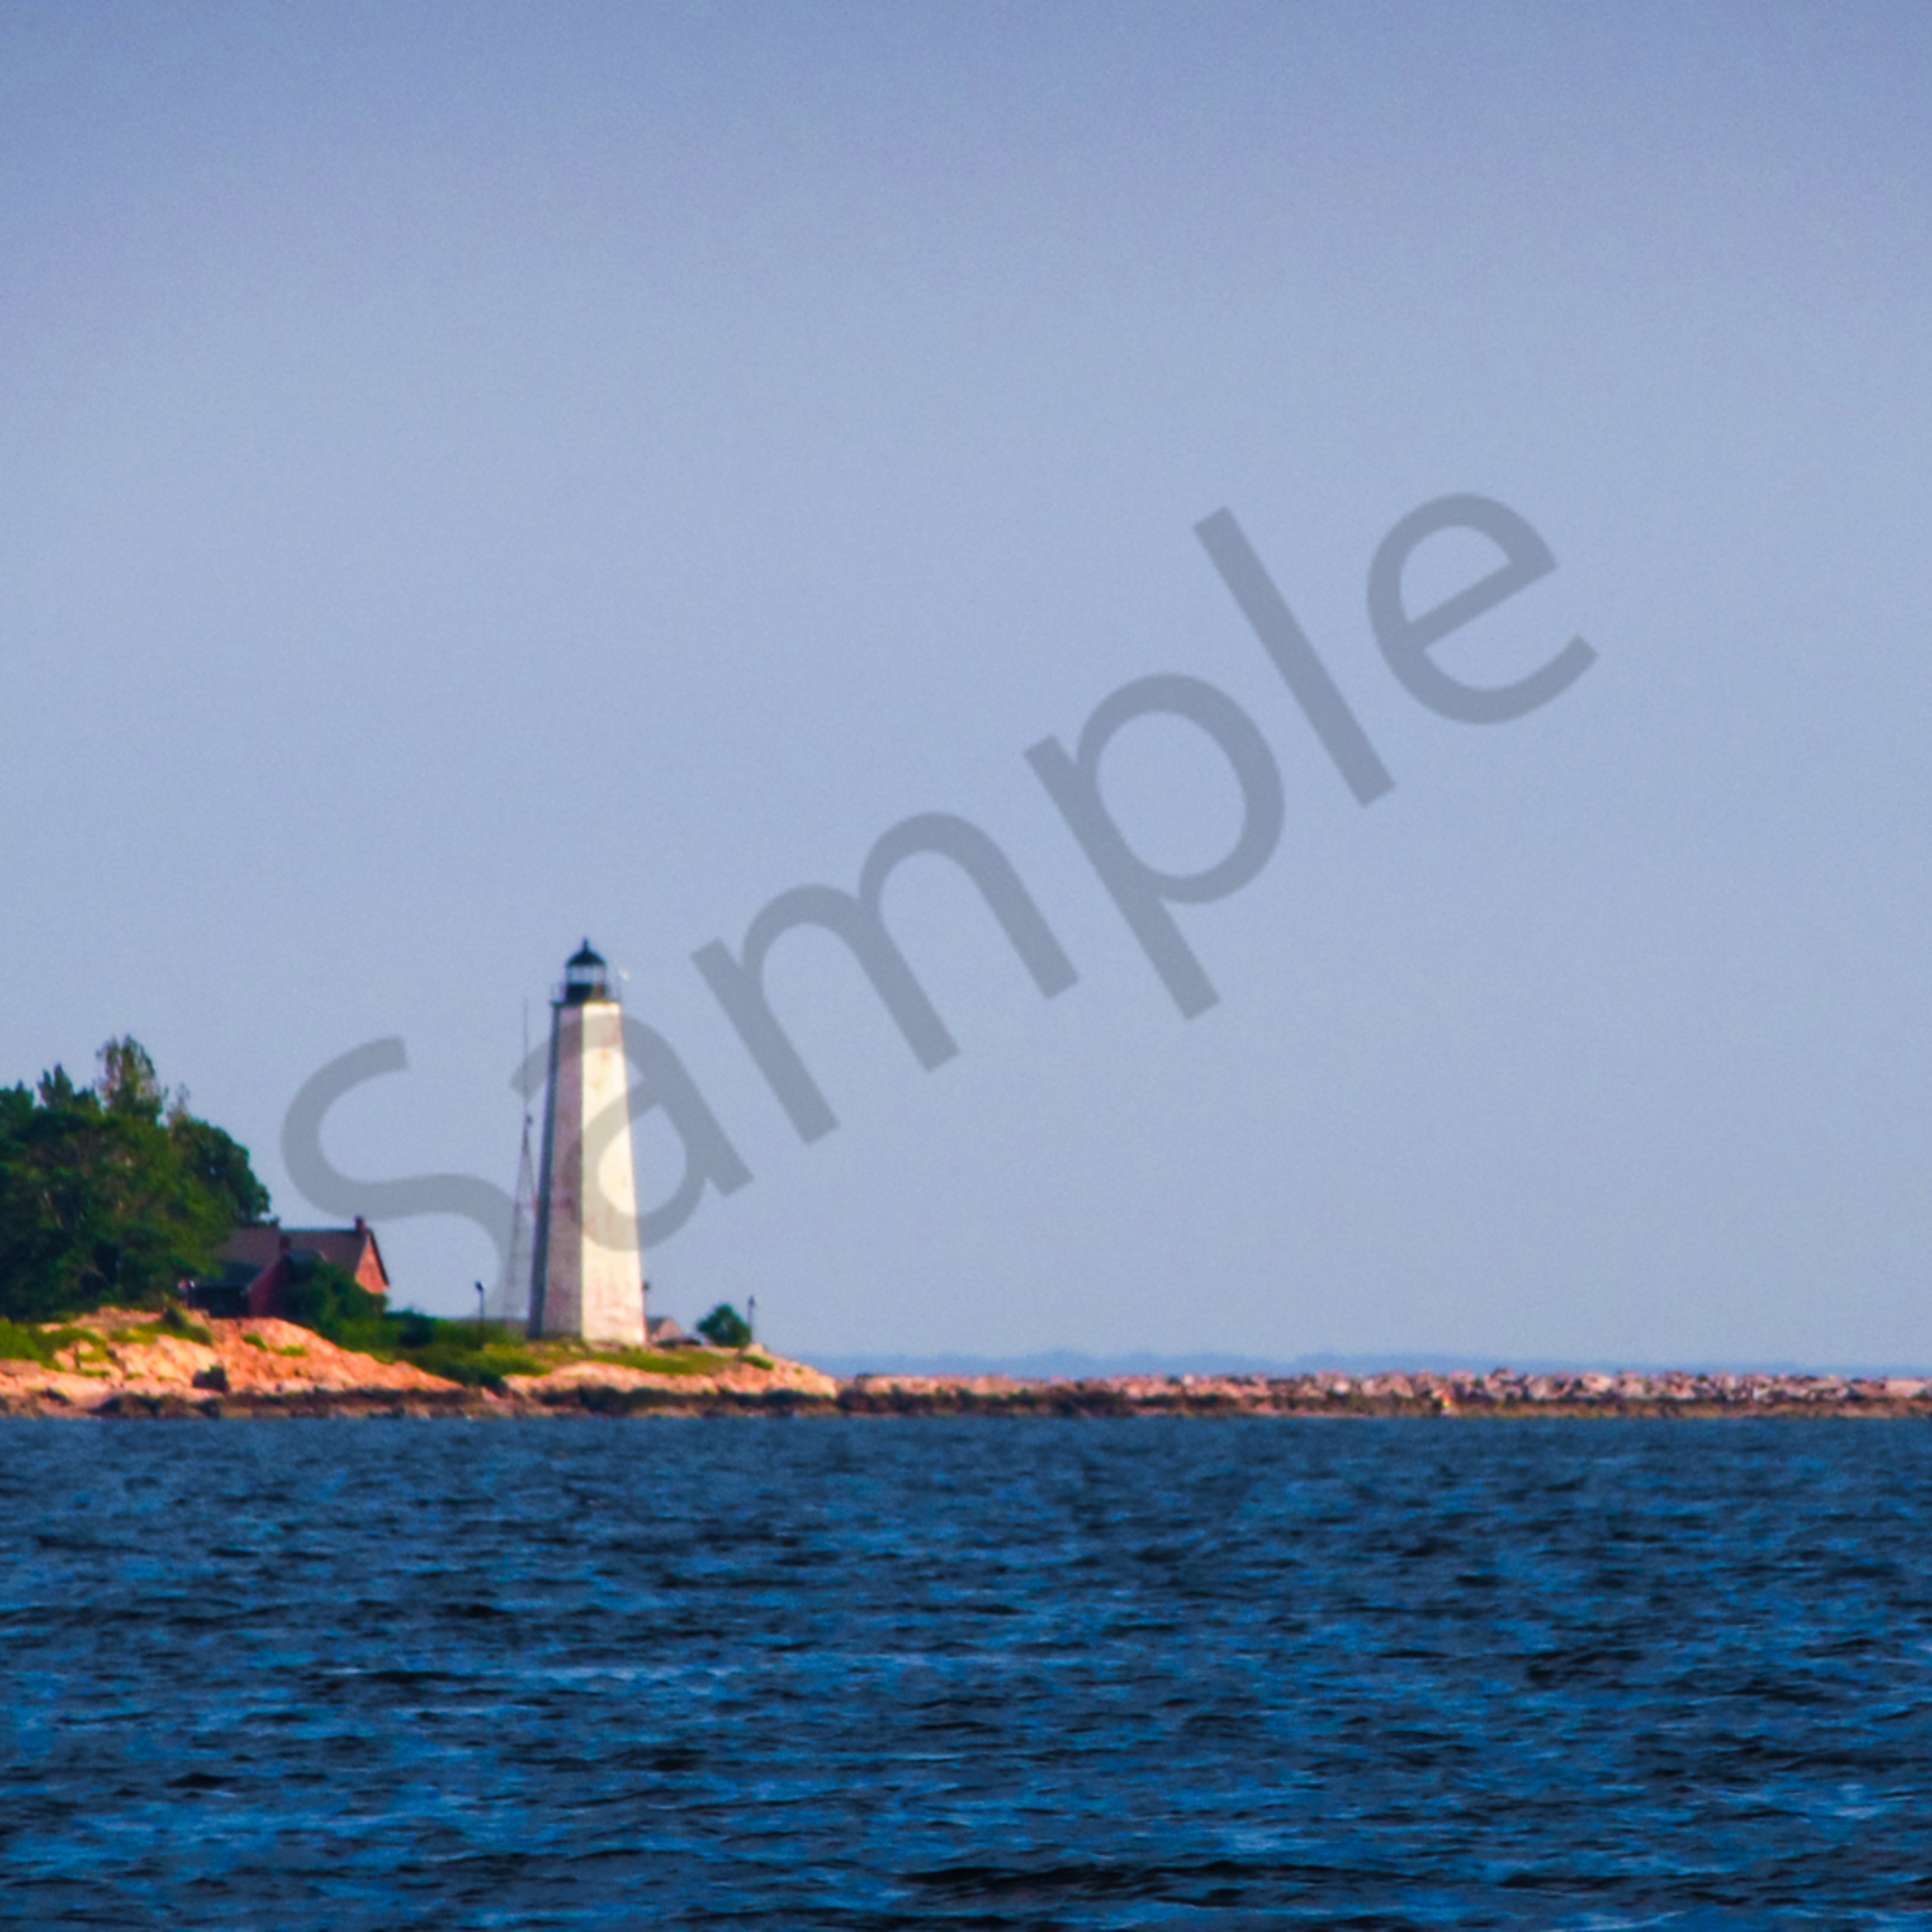 Lighthouse2 1 of 1 c8k2aa